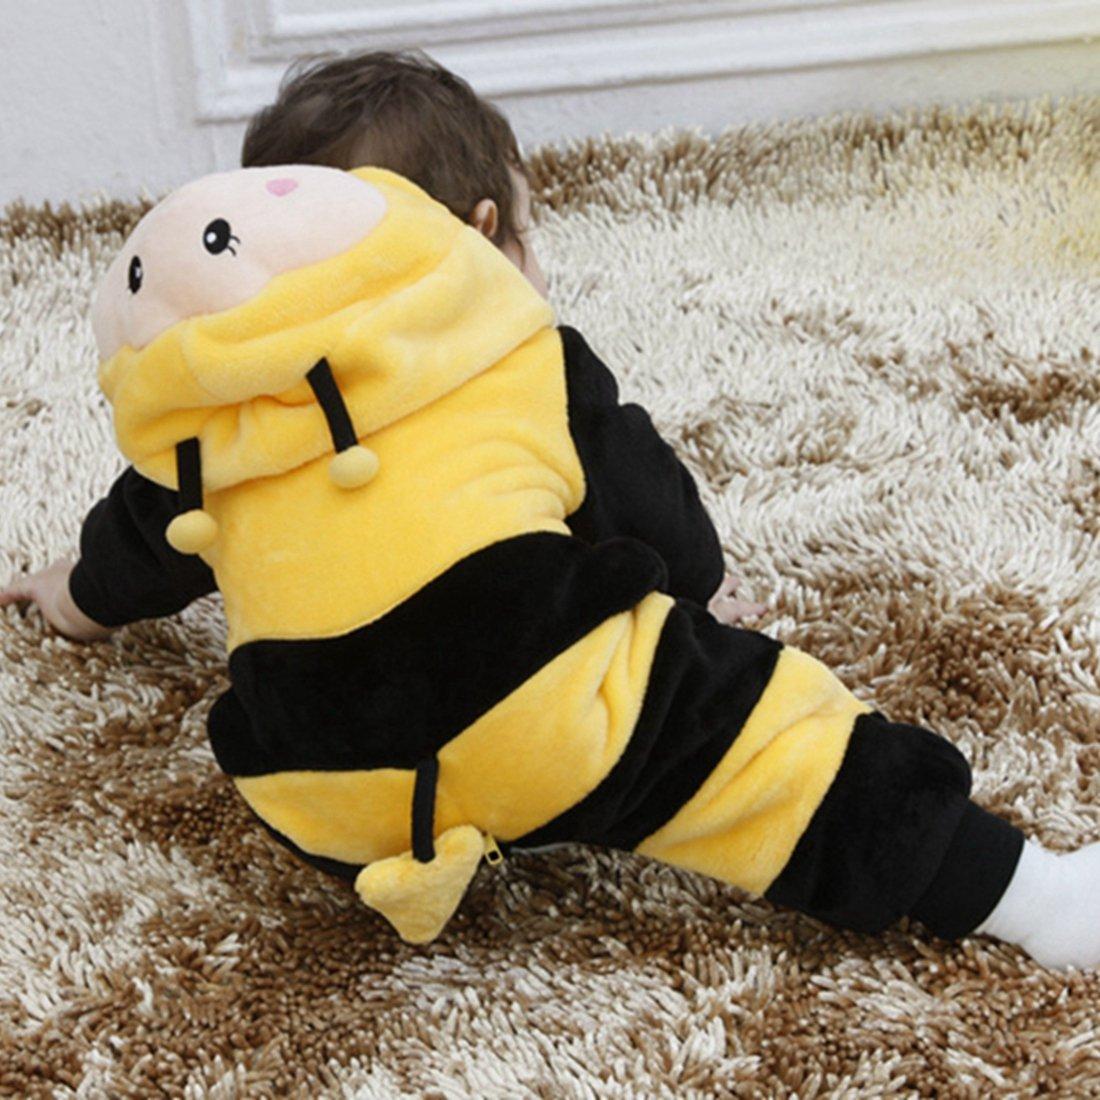 Ropa de Noche con Capucha IFLIFE Beb/é Kigurumi Pijamas Pelele Animal Mono para Ni/ño Ni/ña Infantil